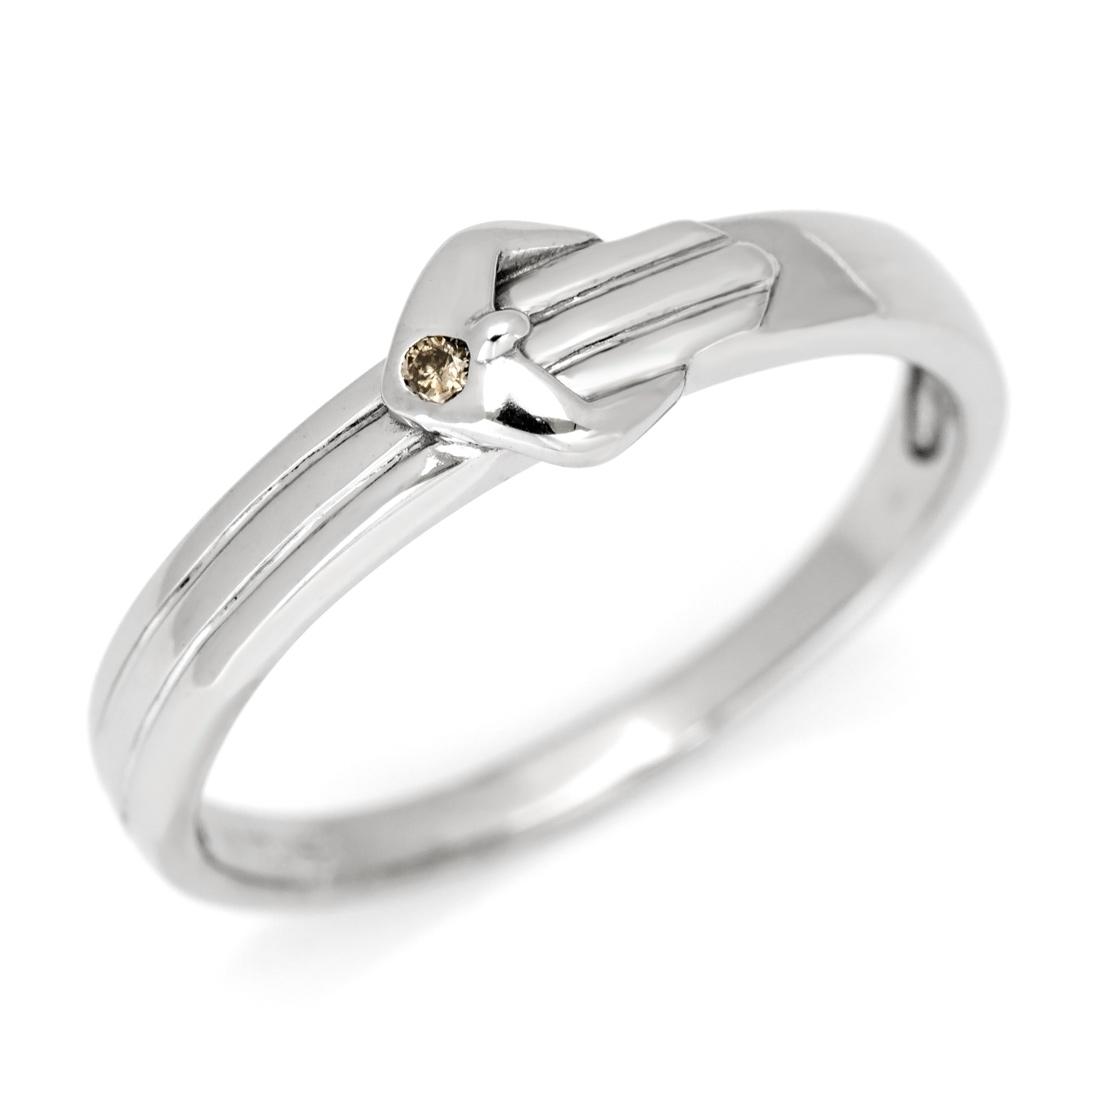 【GWクーポン配布中】SV925 ブラウンダイヤモンド ベルト リング指輪 シルバー925 SILVER スターリングシルバー ダイアモンド 誕生日 4月誕生石 刻印 文字入れ メッセージ ギフト 贈り物 ピンキーリング対応可能